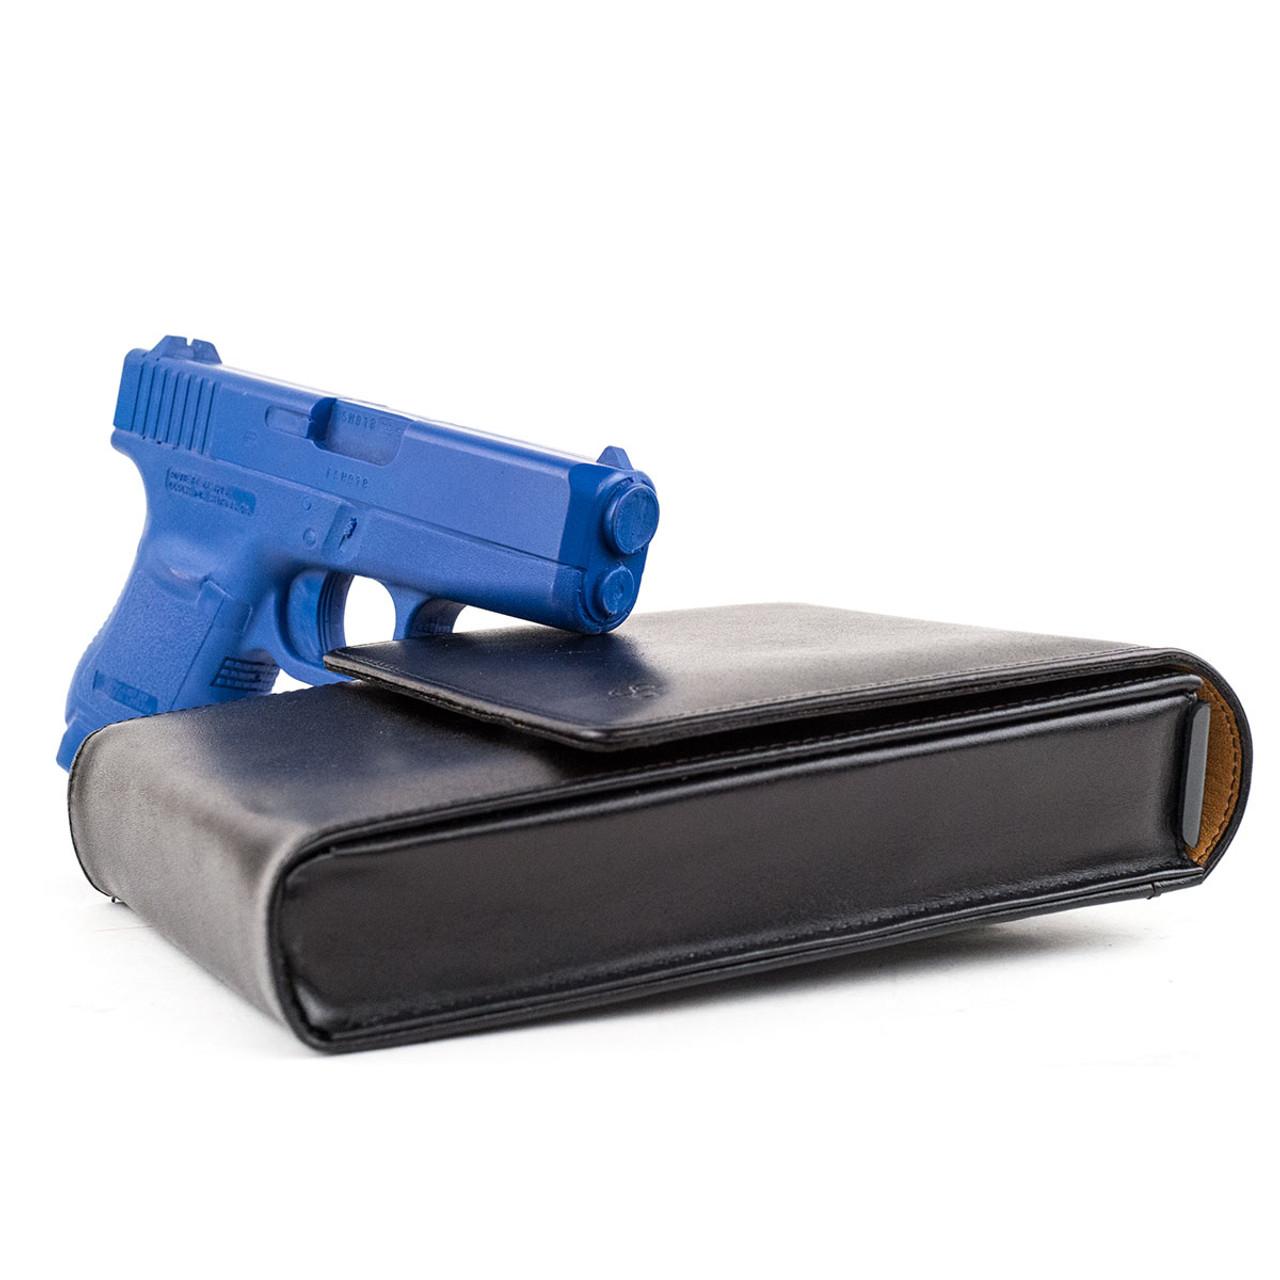 Glock 36 Concealed Carry Holster (Belt Loop)